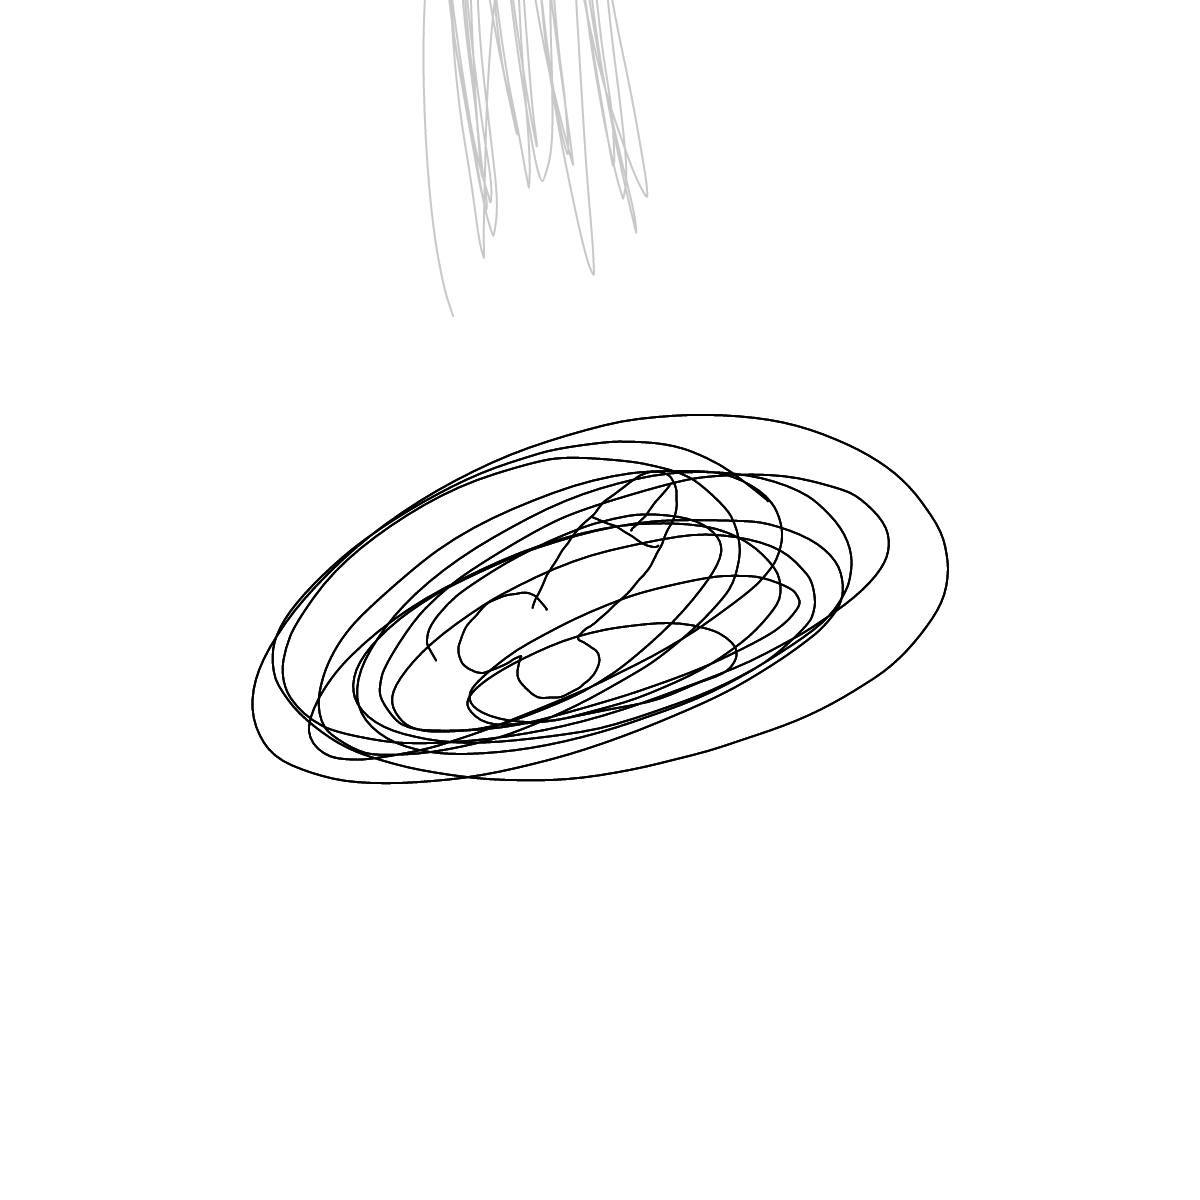 BAAAM drawing#23545 lat:65.0164794921875000lng: -158.3015747070312500